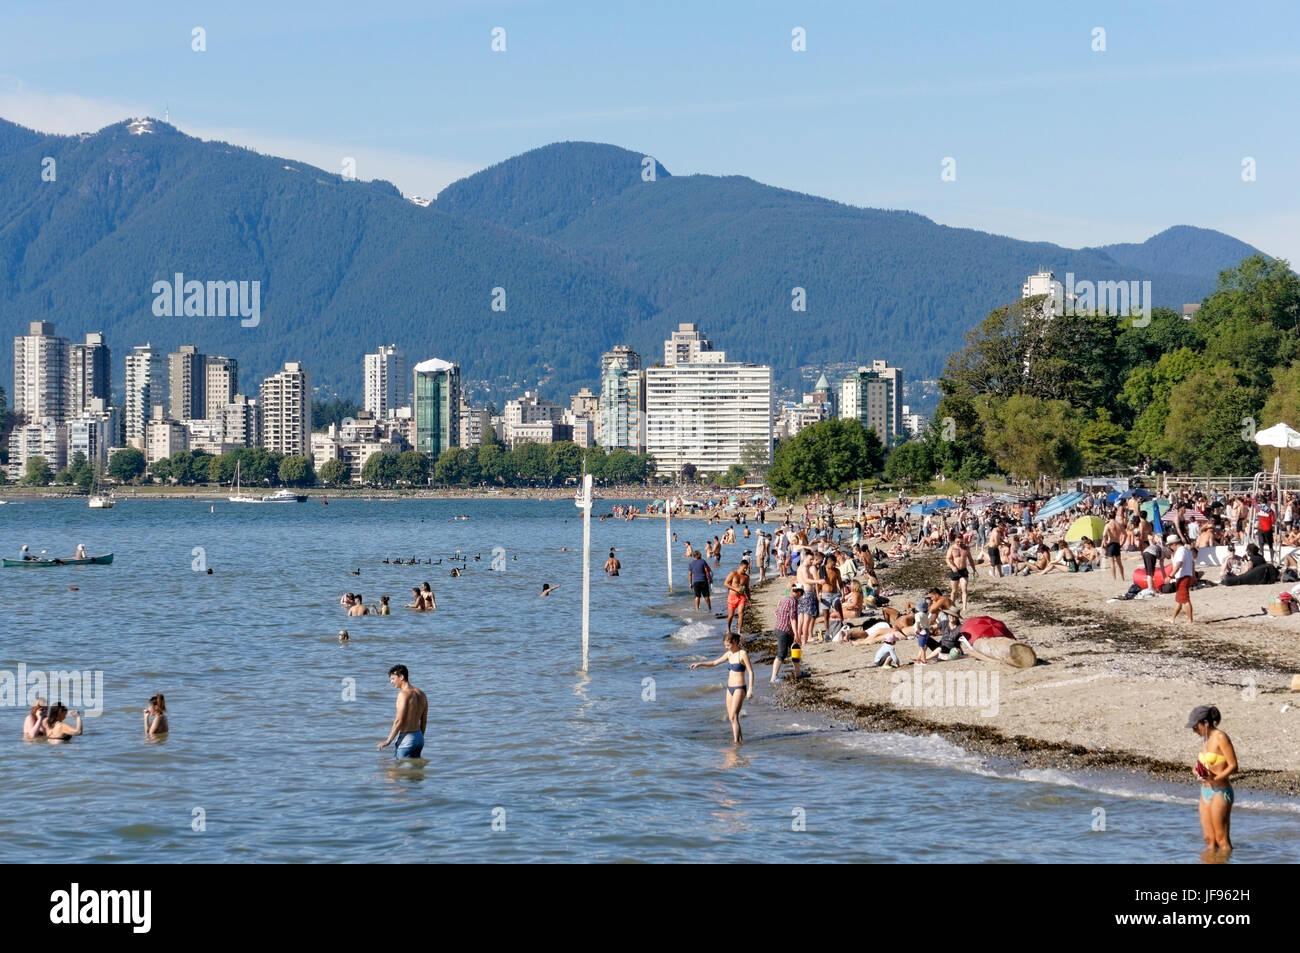 Personnes bronzer et nager dans la baie English à Kitsilano Beach, Vancouver, British Columbia, Canada Photo Stock